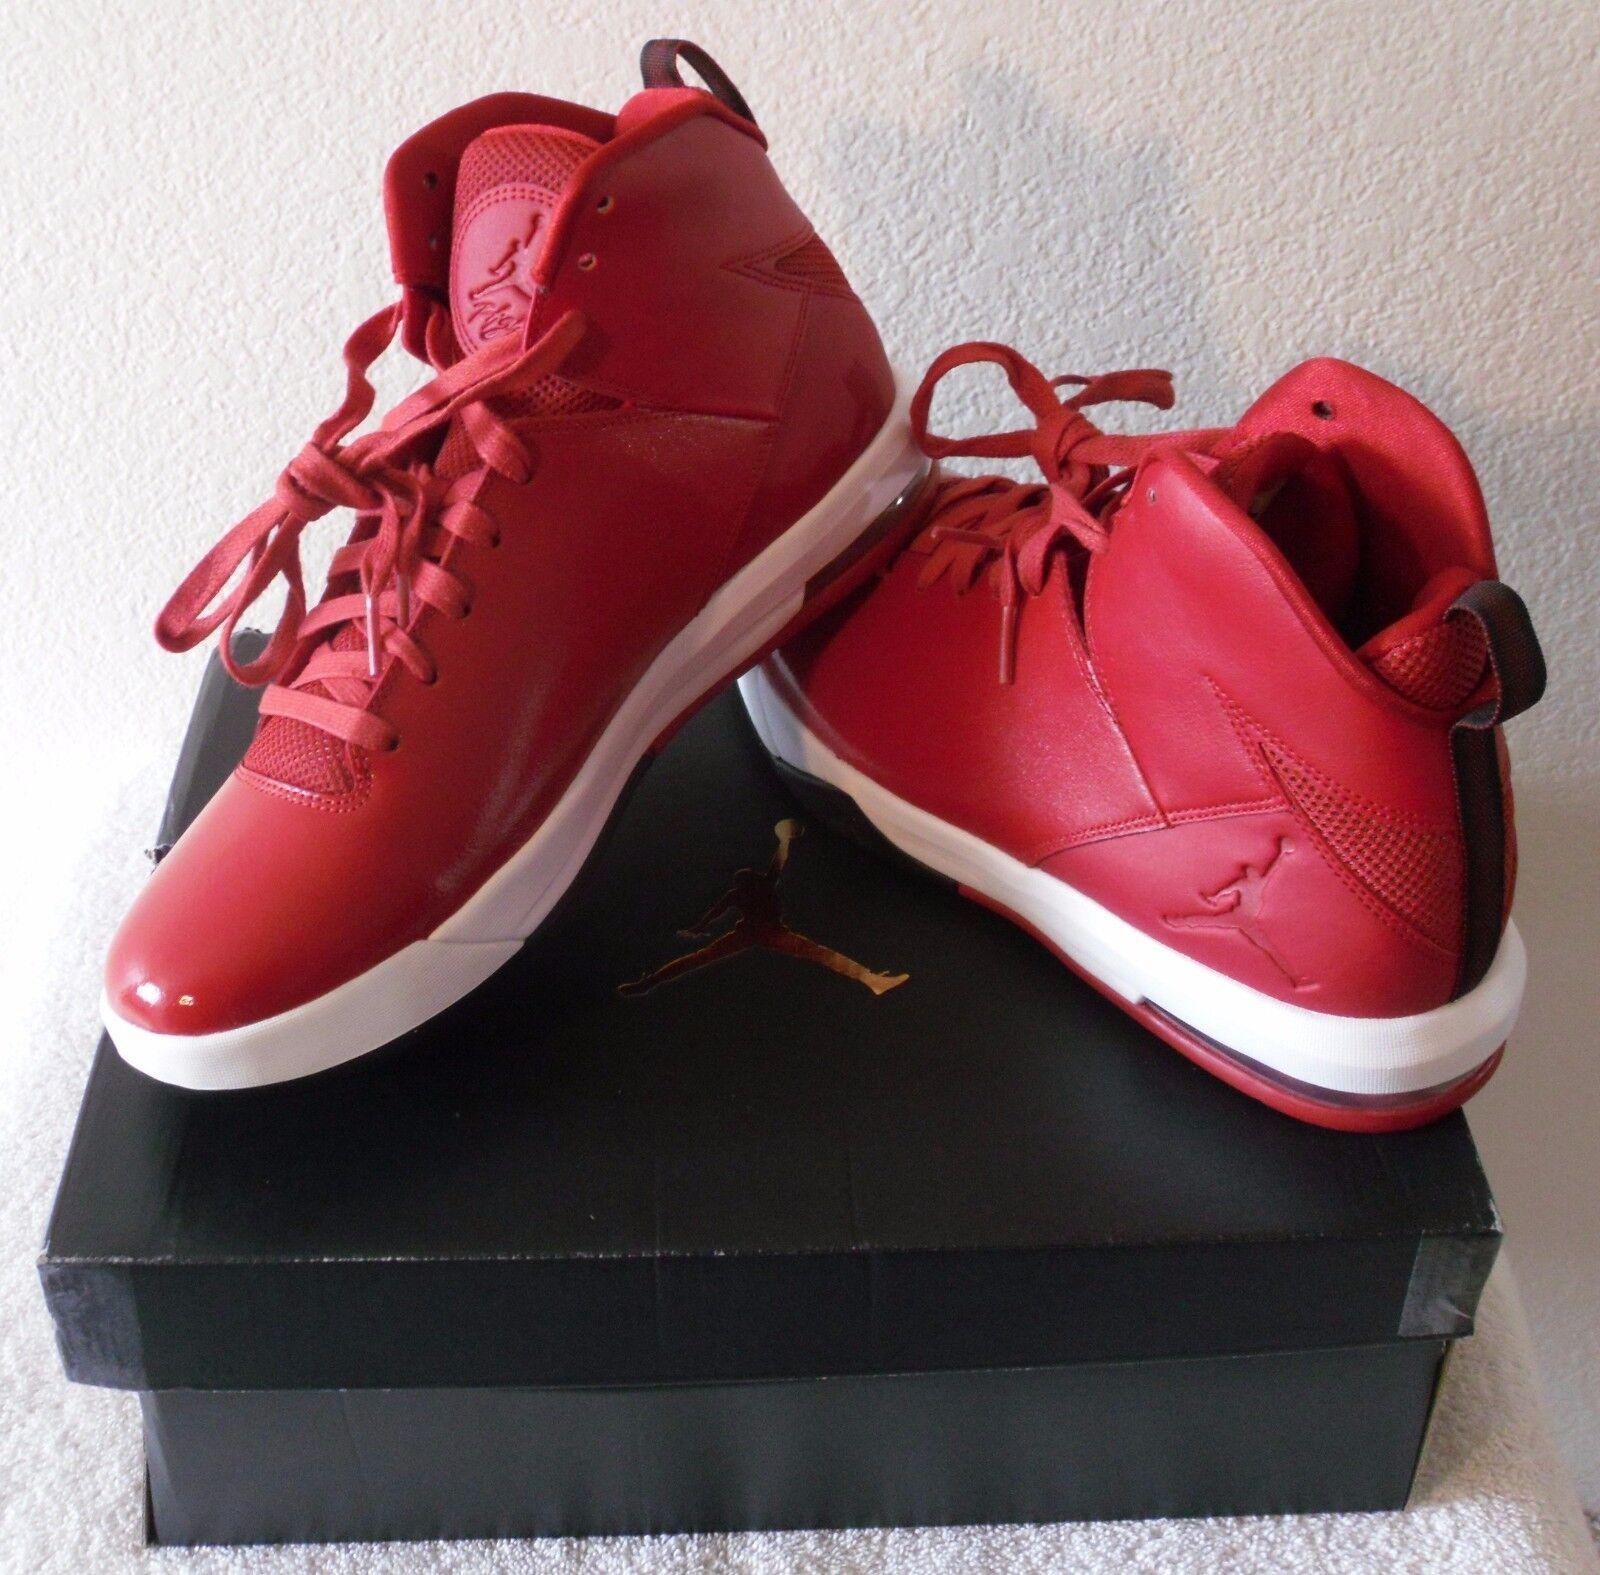 Nuevo en caja Nike para hombres Imminent zapatos para baloncesto Imminent hombres 10 Jordan Air Gimnasio Rojo/Negro MSRP 130 a9b82e